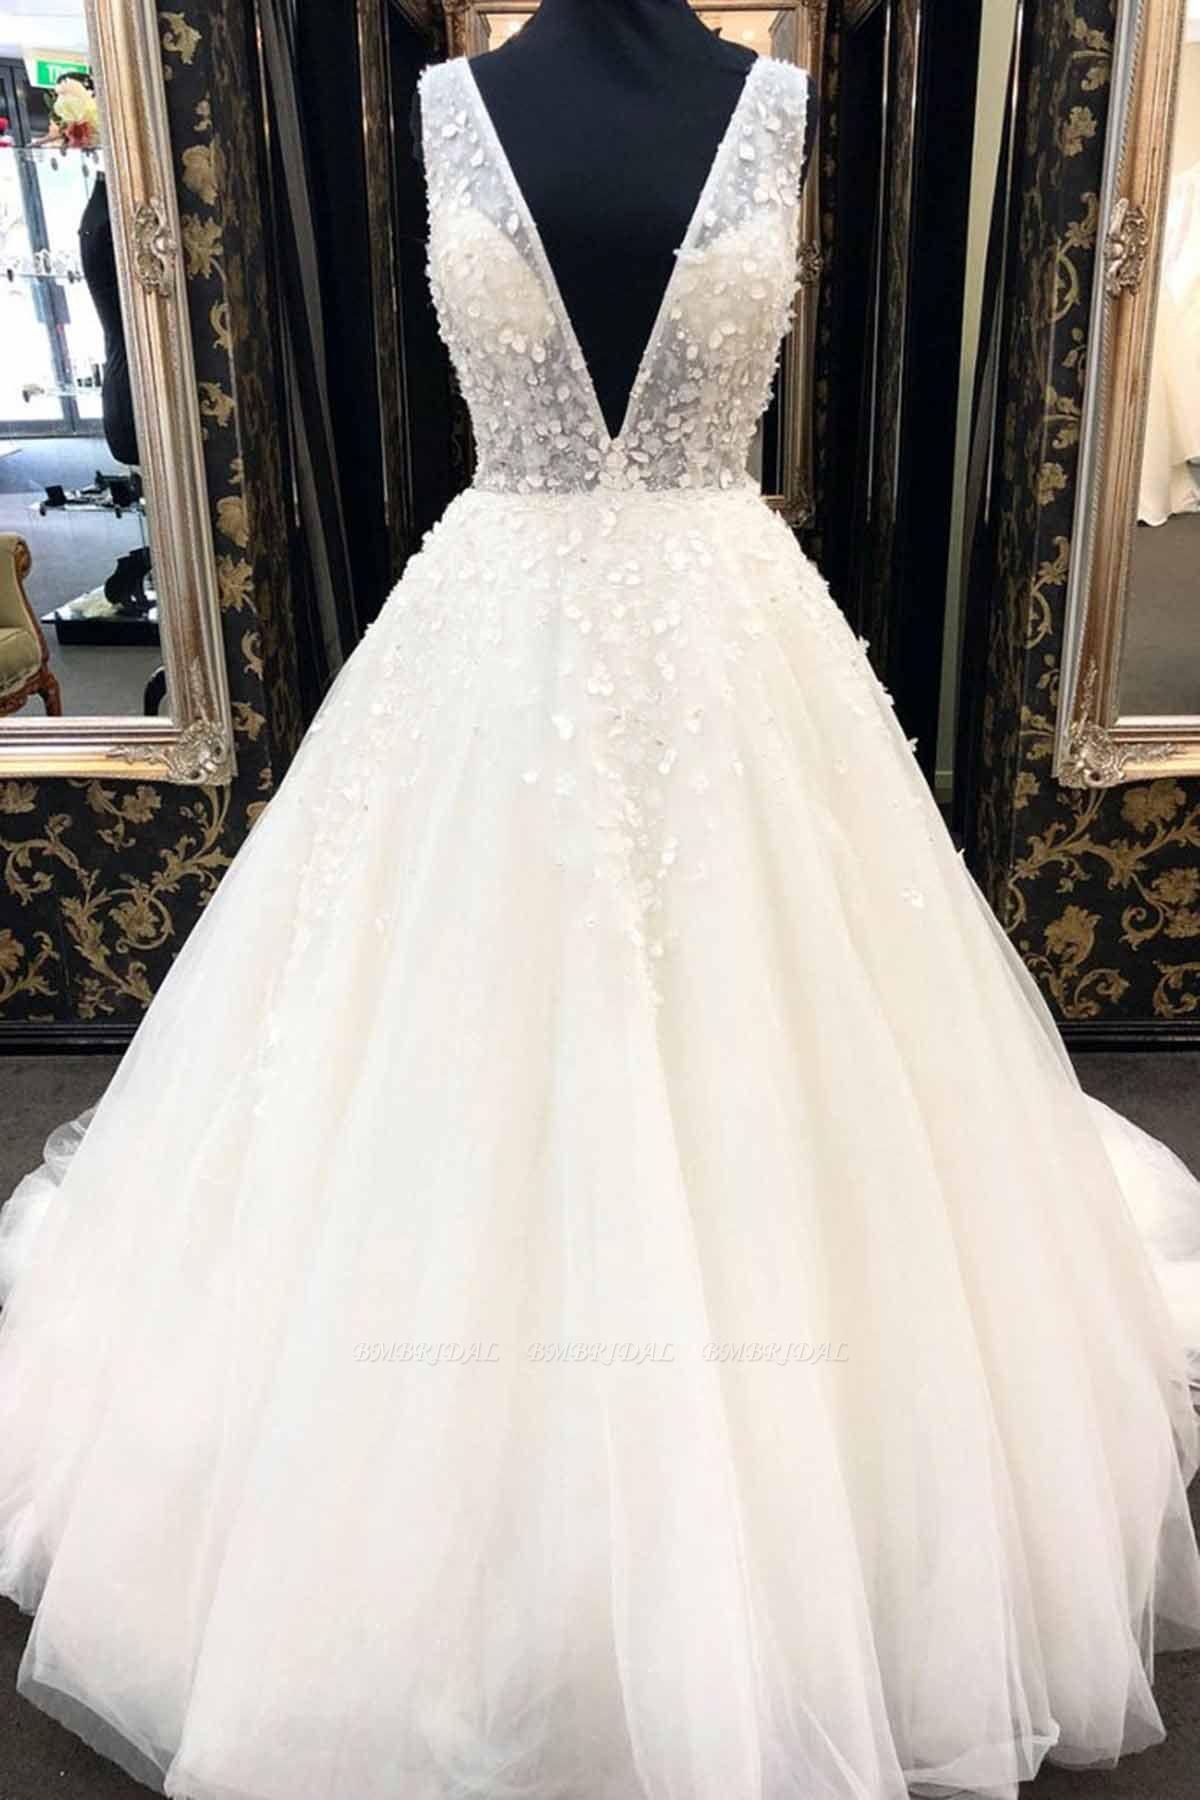 AffordableWhite Tulle V-Neck Long Wedding Dress A-Line Applqiues Bridal Gowns On Sale